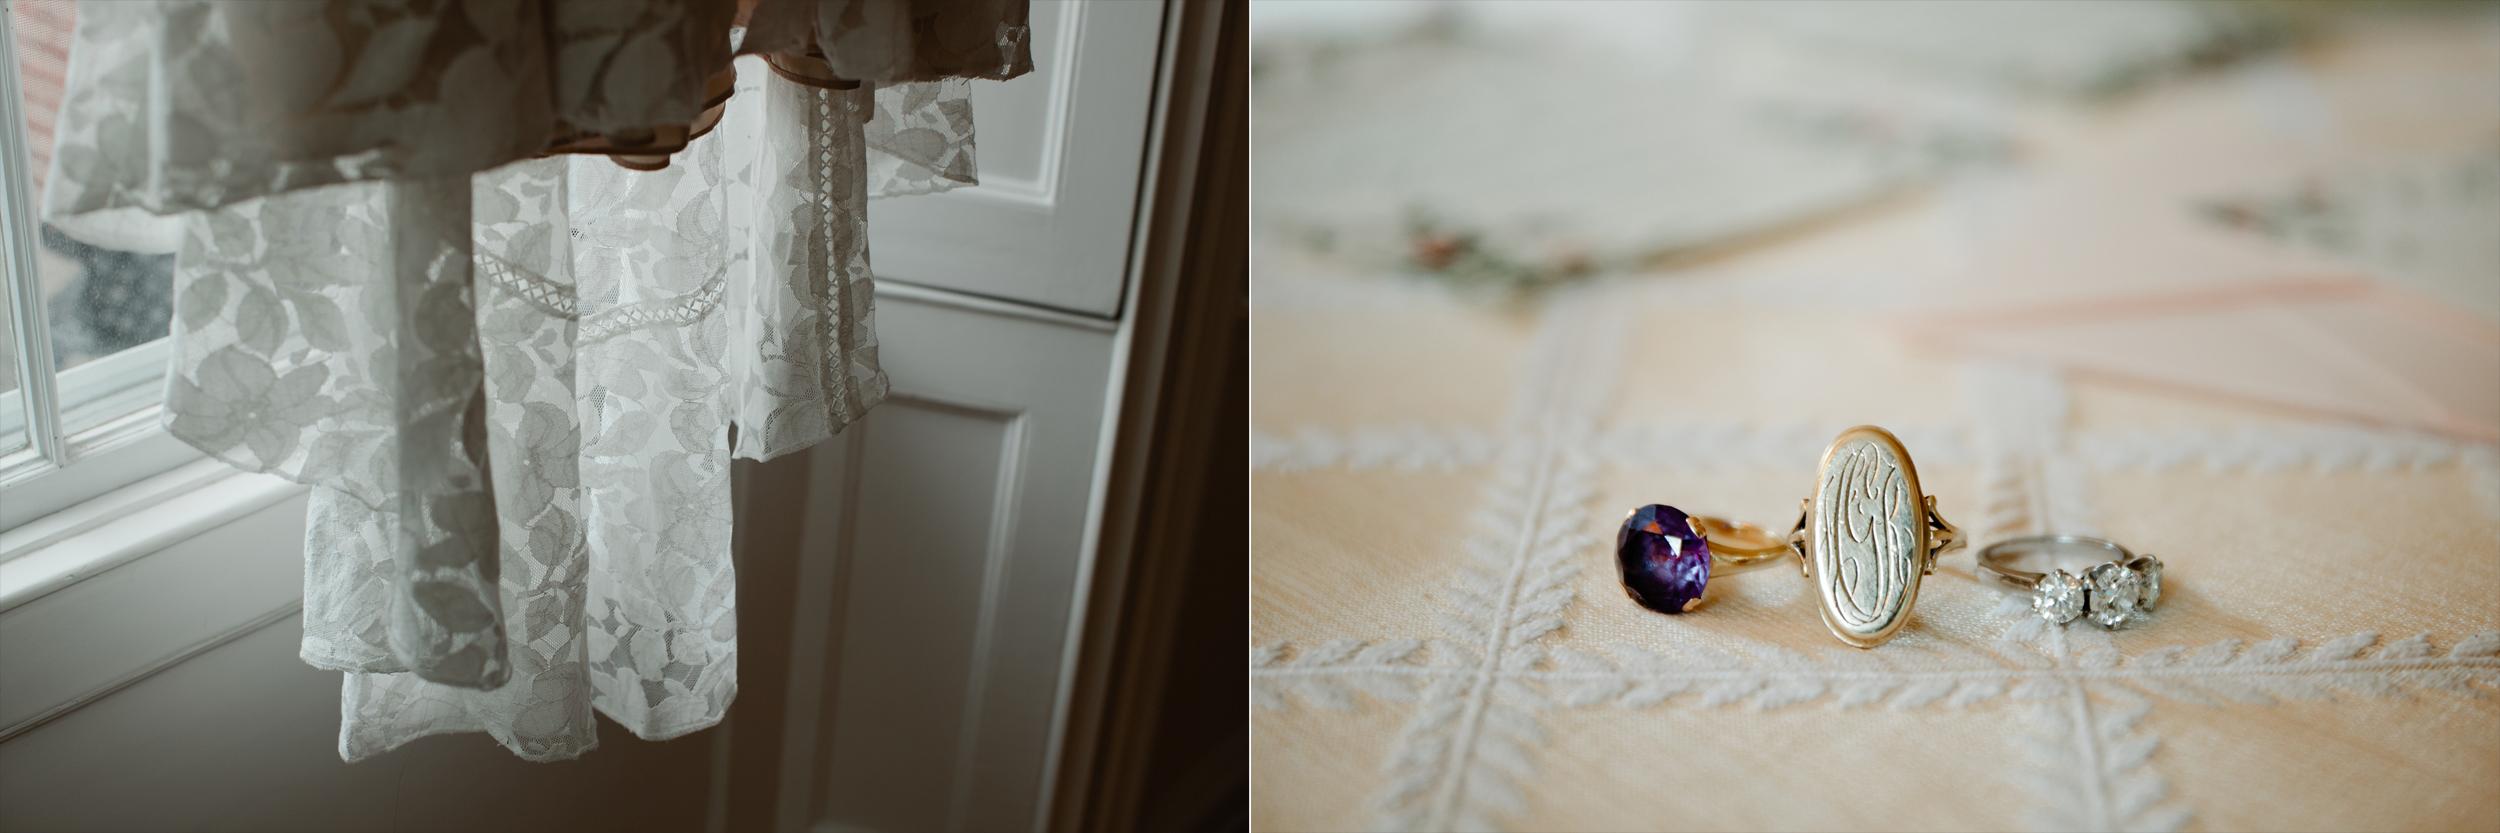 Best-Maine-Wedding-Photographer-1e.jpg